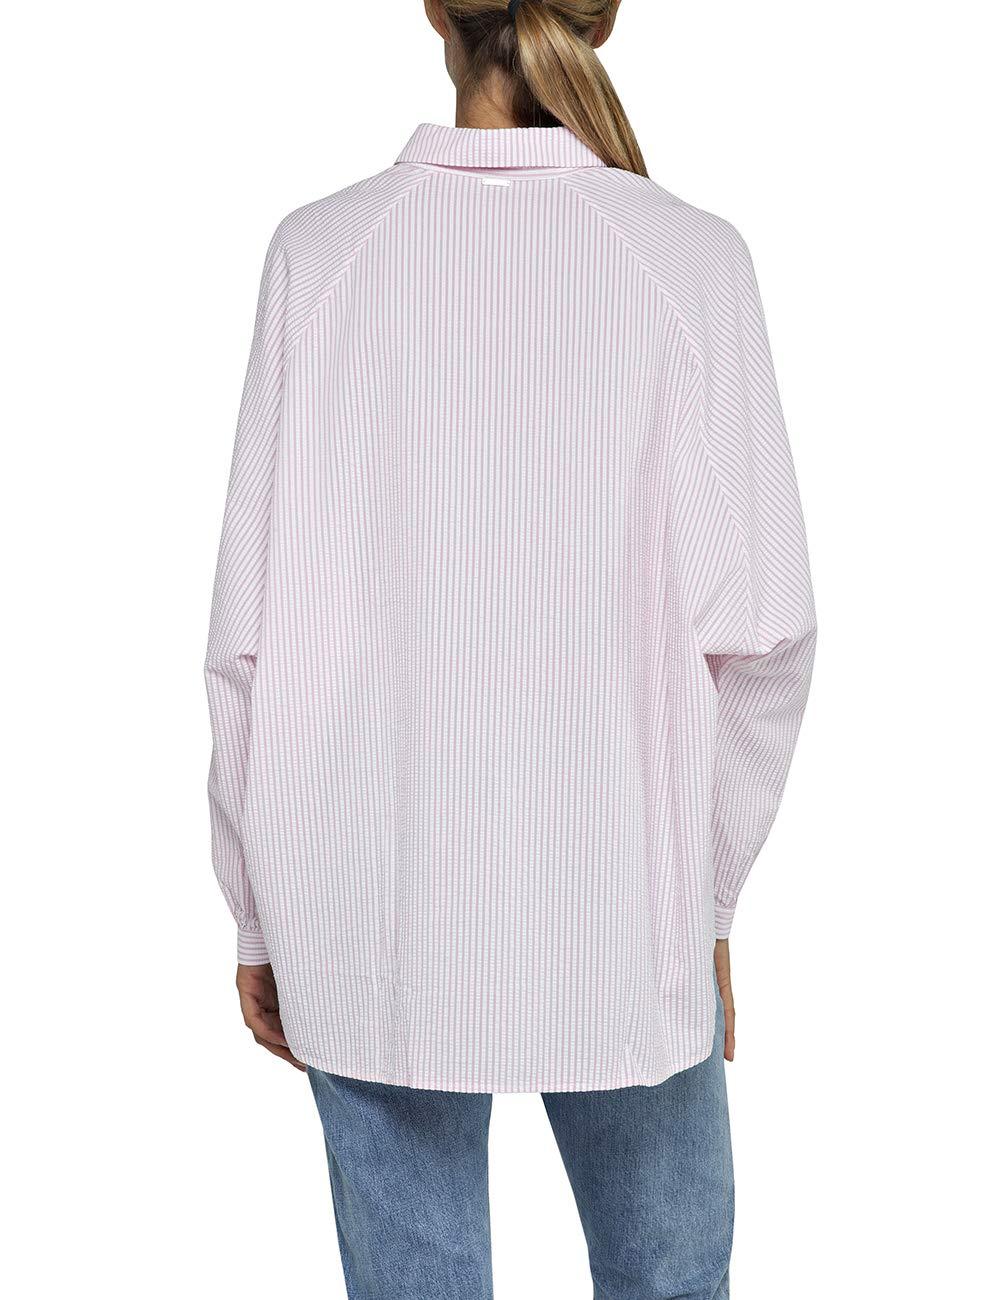 Replay dam blus Flerfärgad (White/Pink Stripe 10)